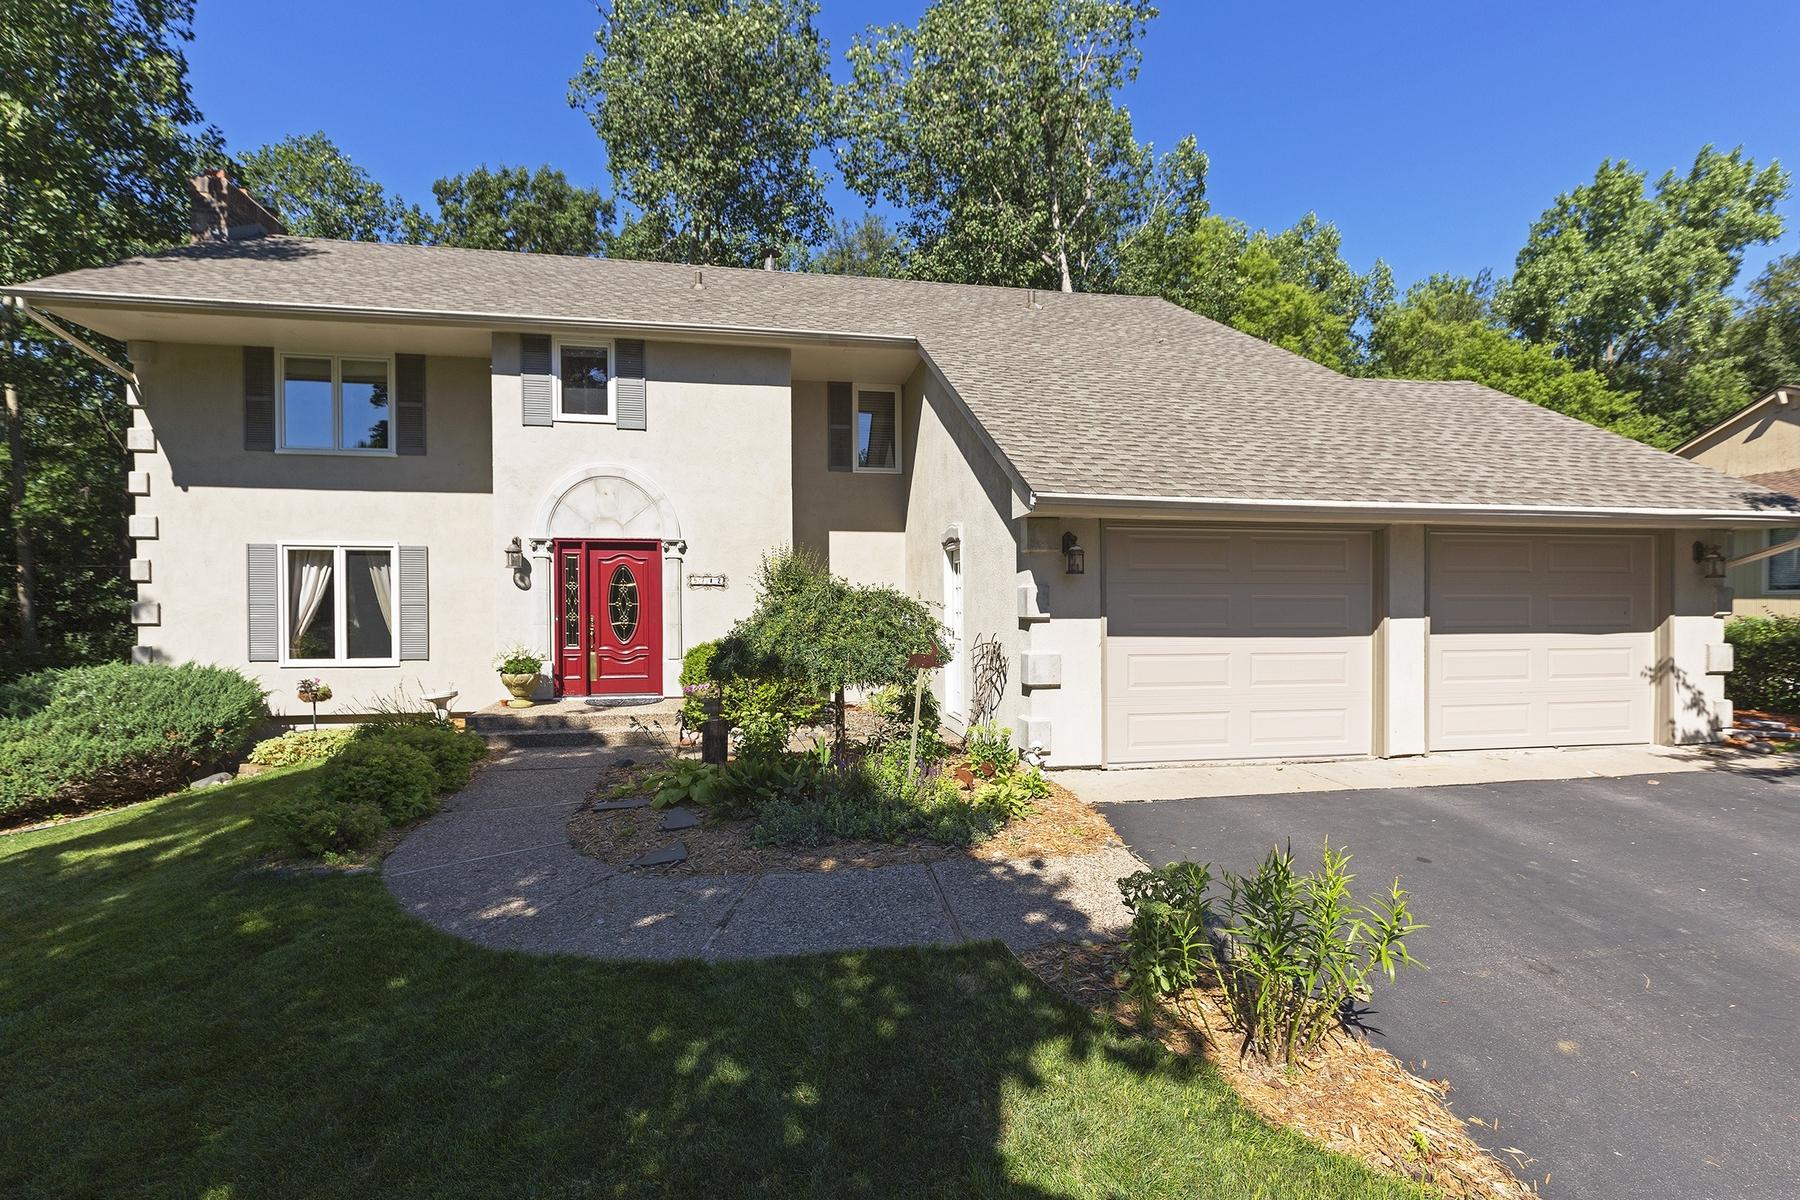 Single Family Home for Sale at 5712 Parkwood Lane Edina, Minnesota 55436 United States